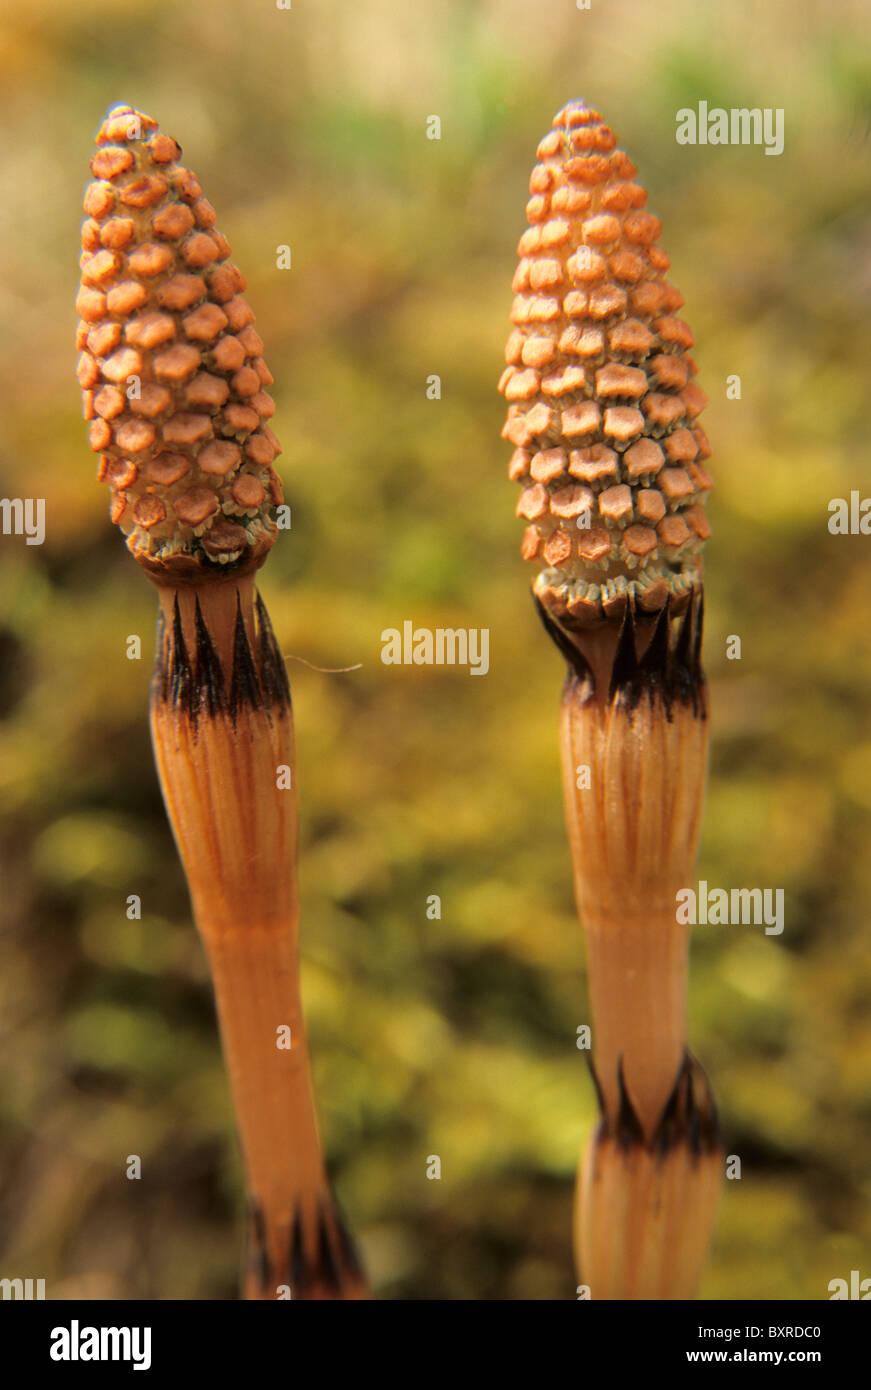 Field Horsetail or Common Horsetail, - Equisetum arvense - Stock Photo